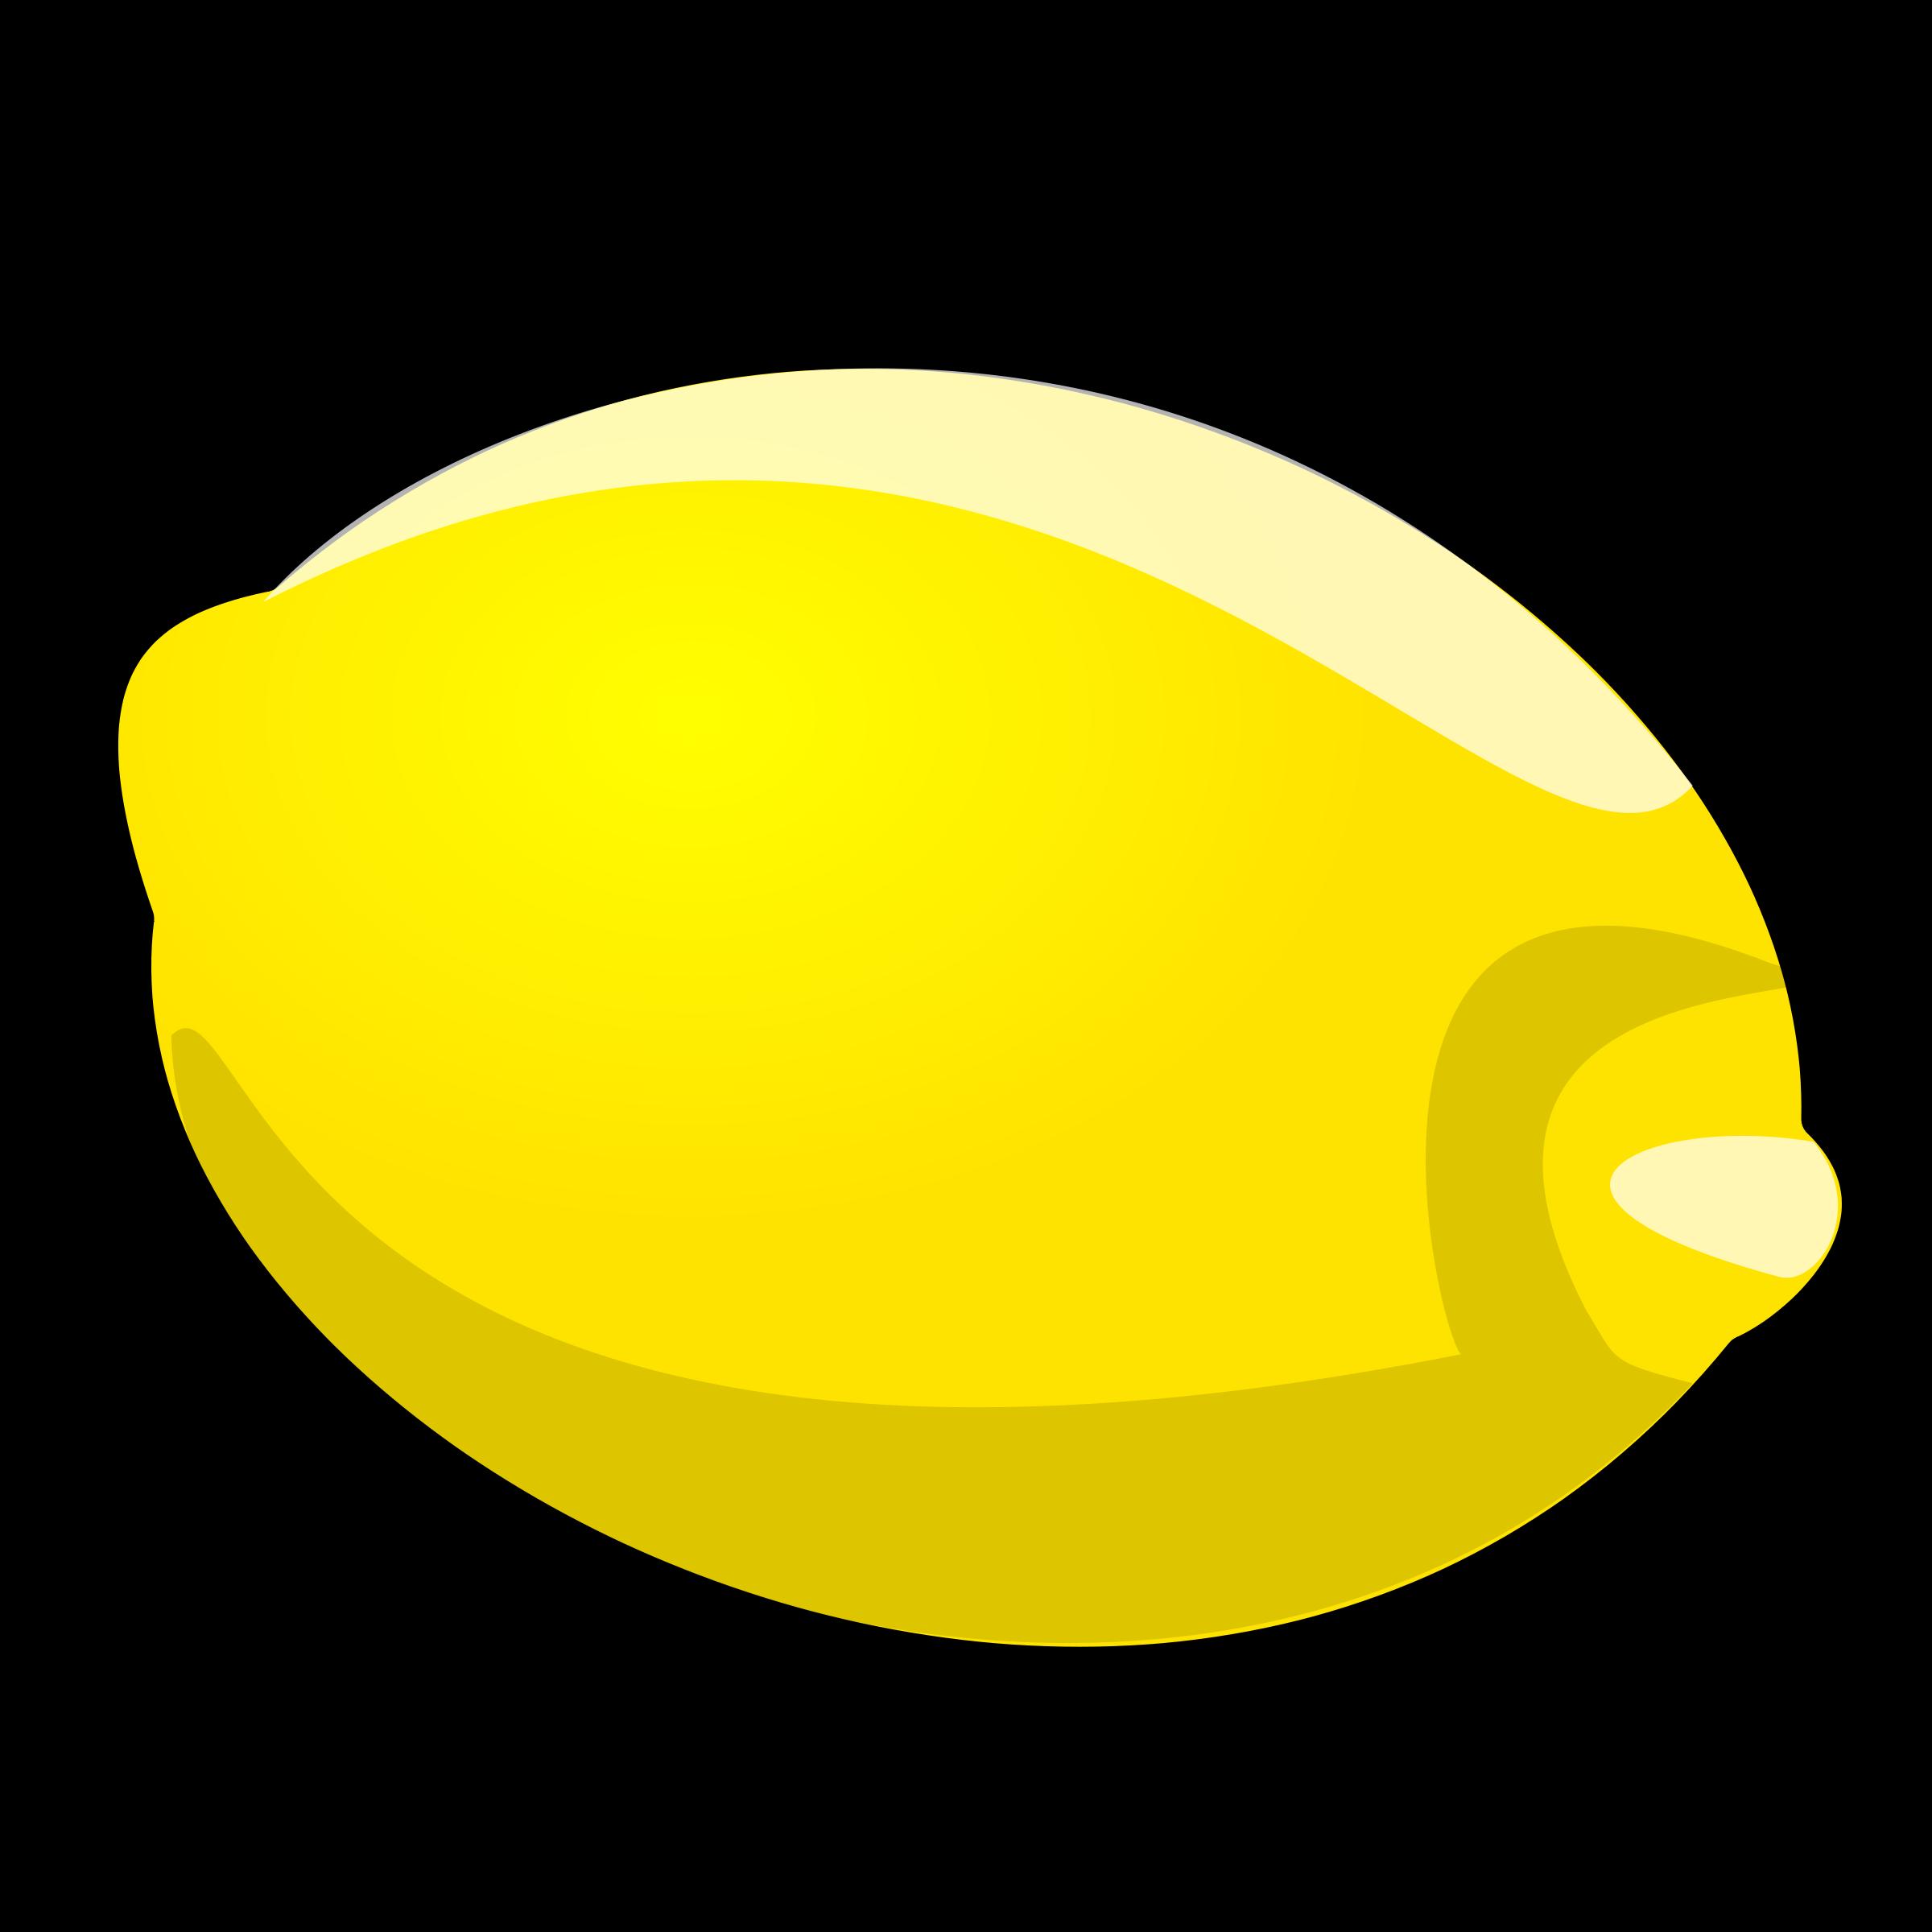 Lemons clipart painted. Lemon clip art free